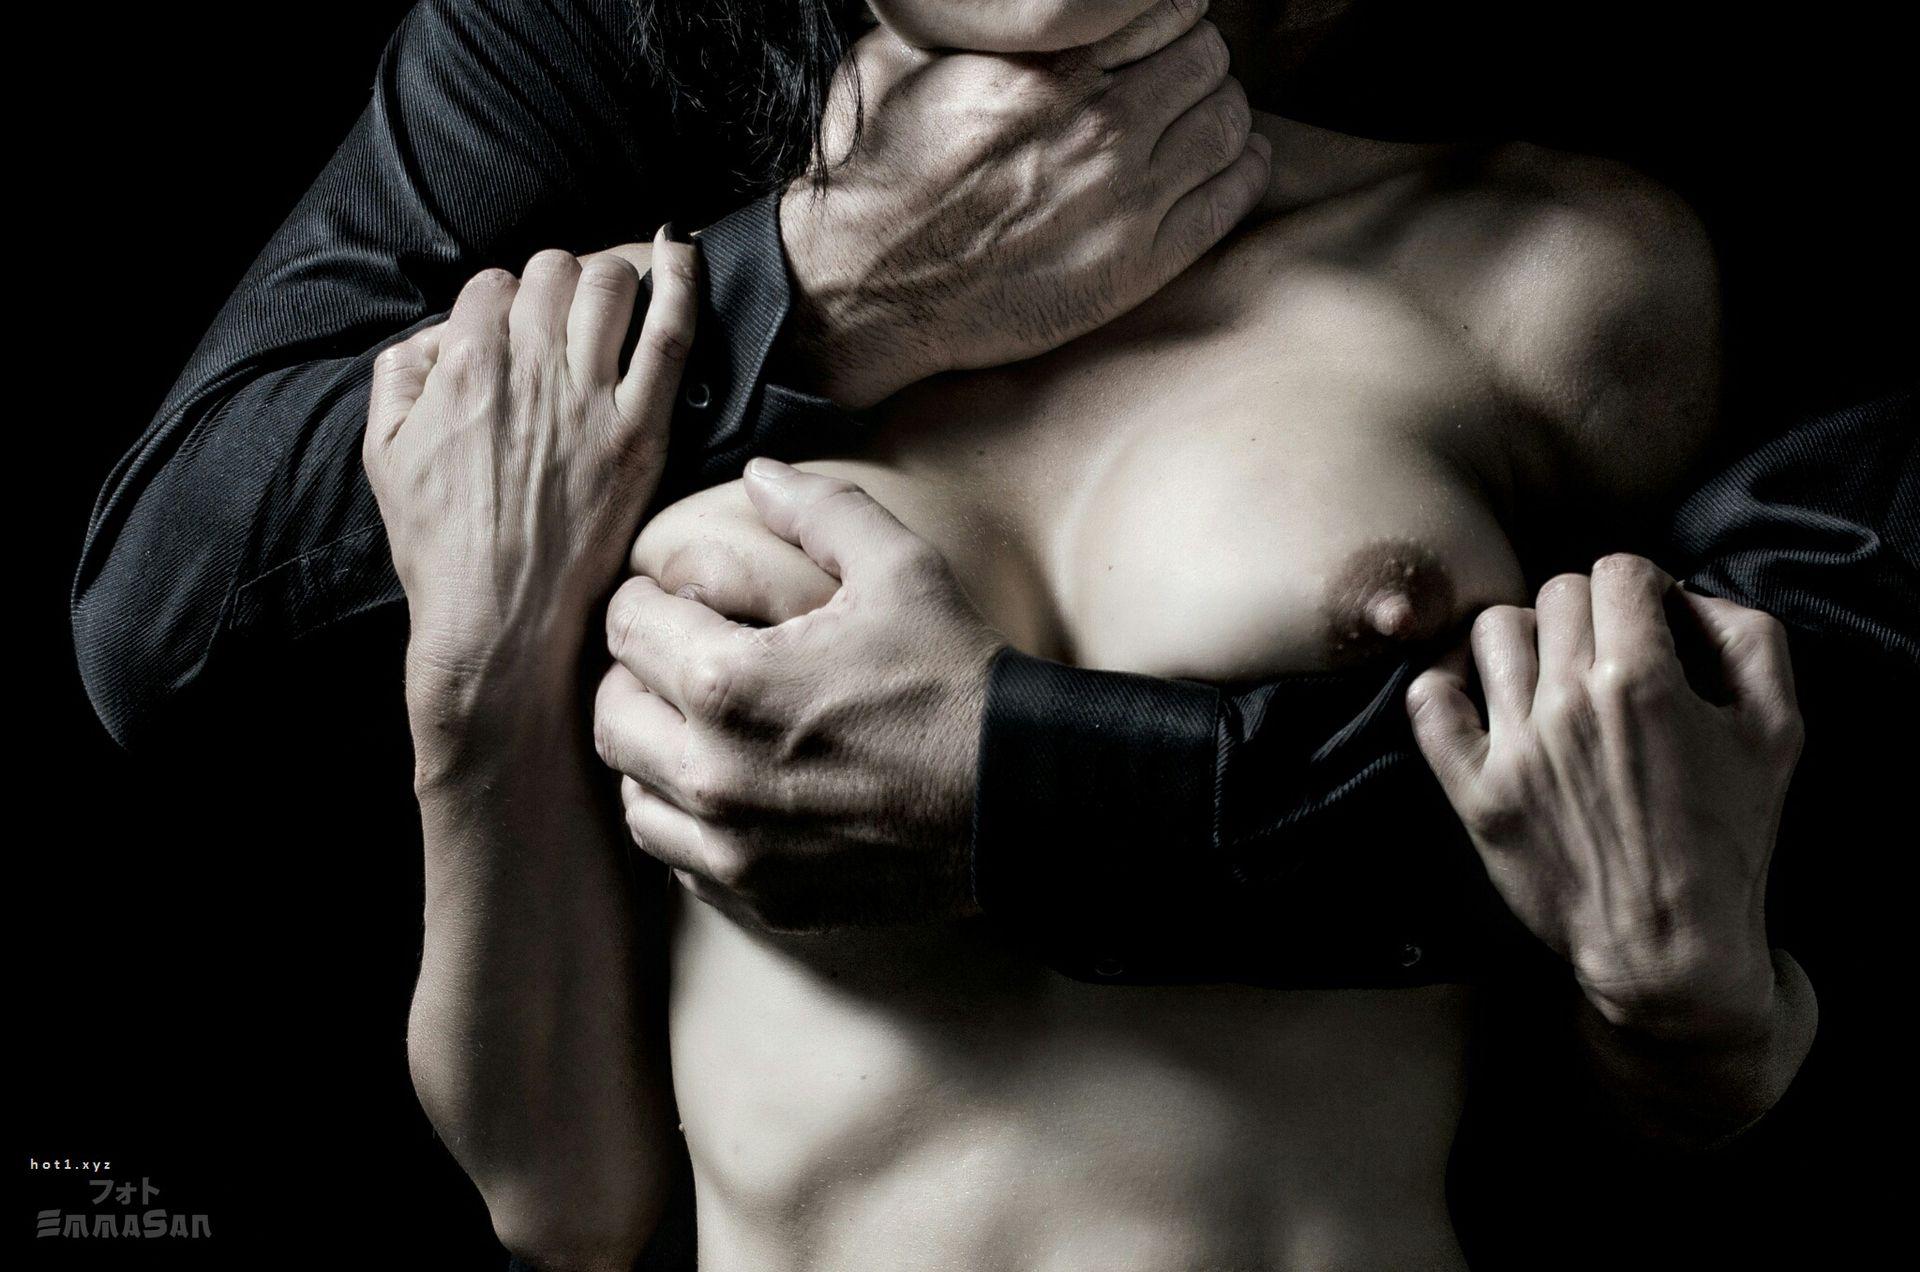 Мужчина держит сиськи девушки